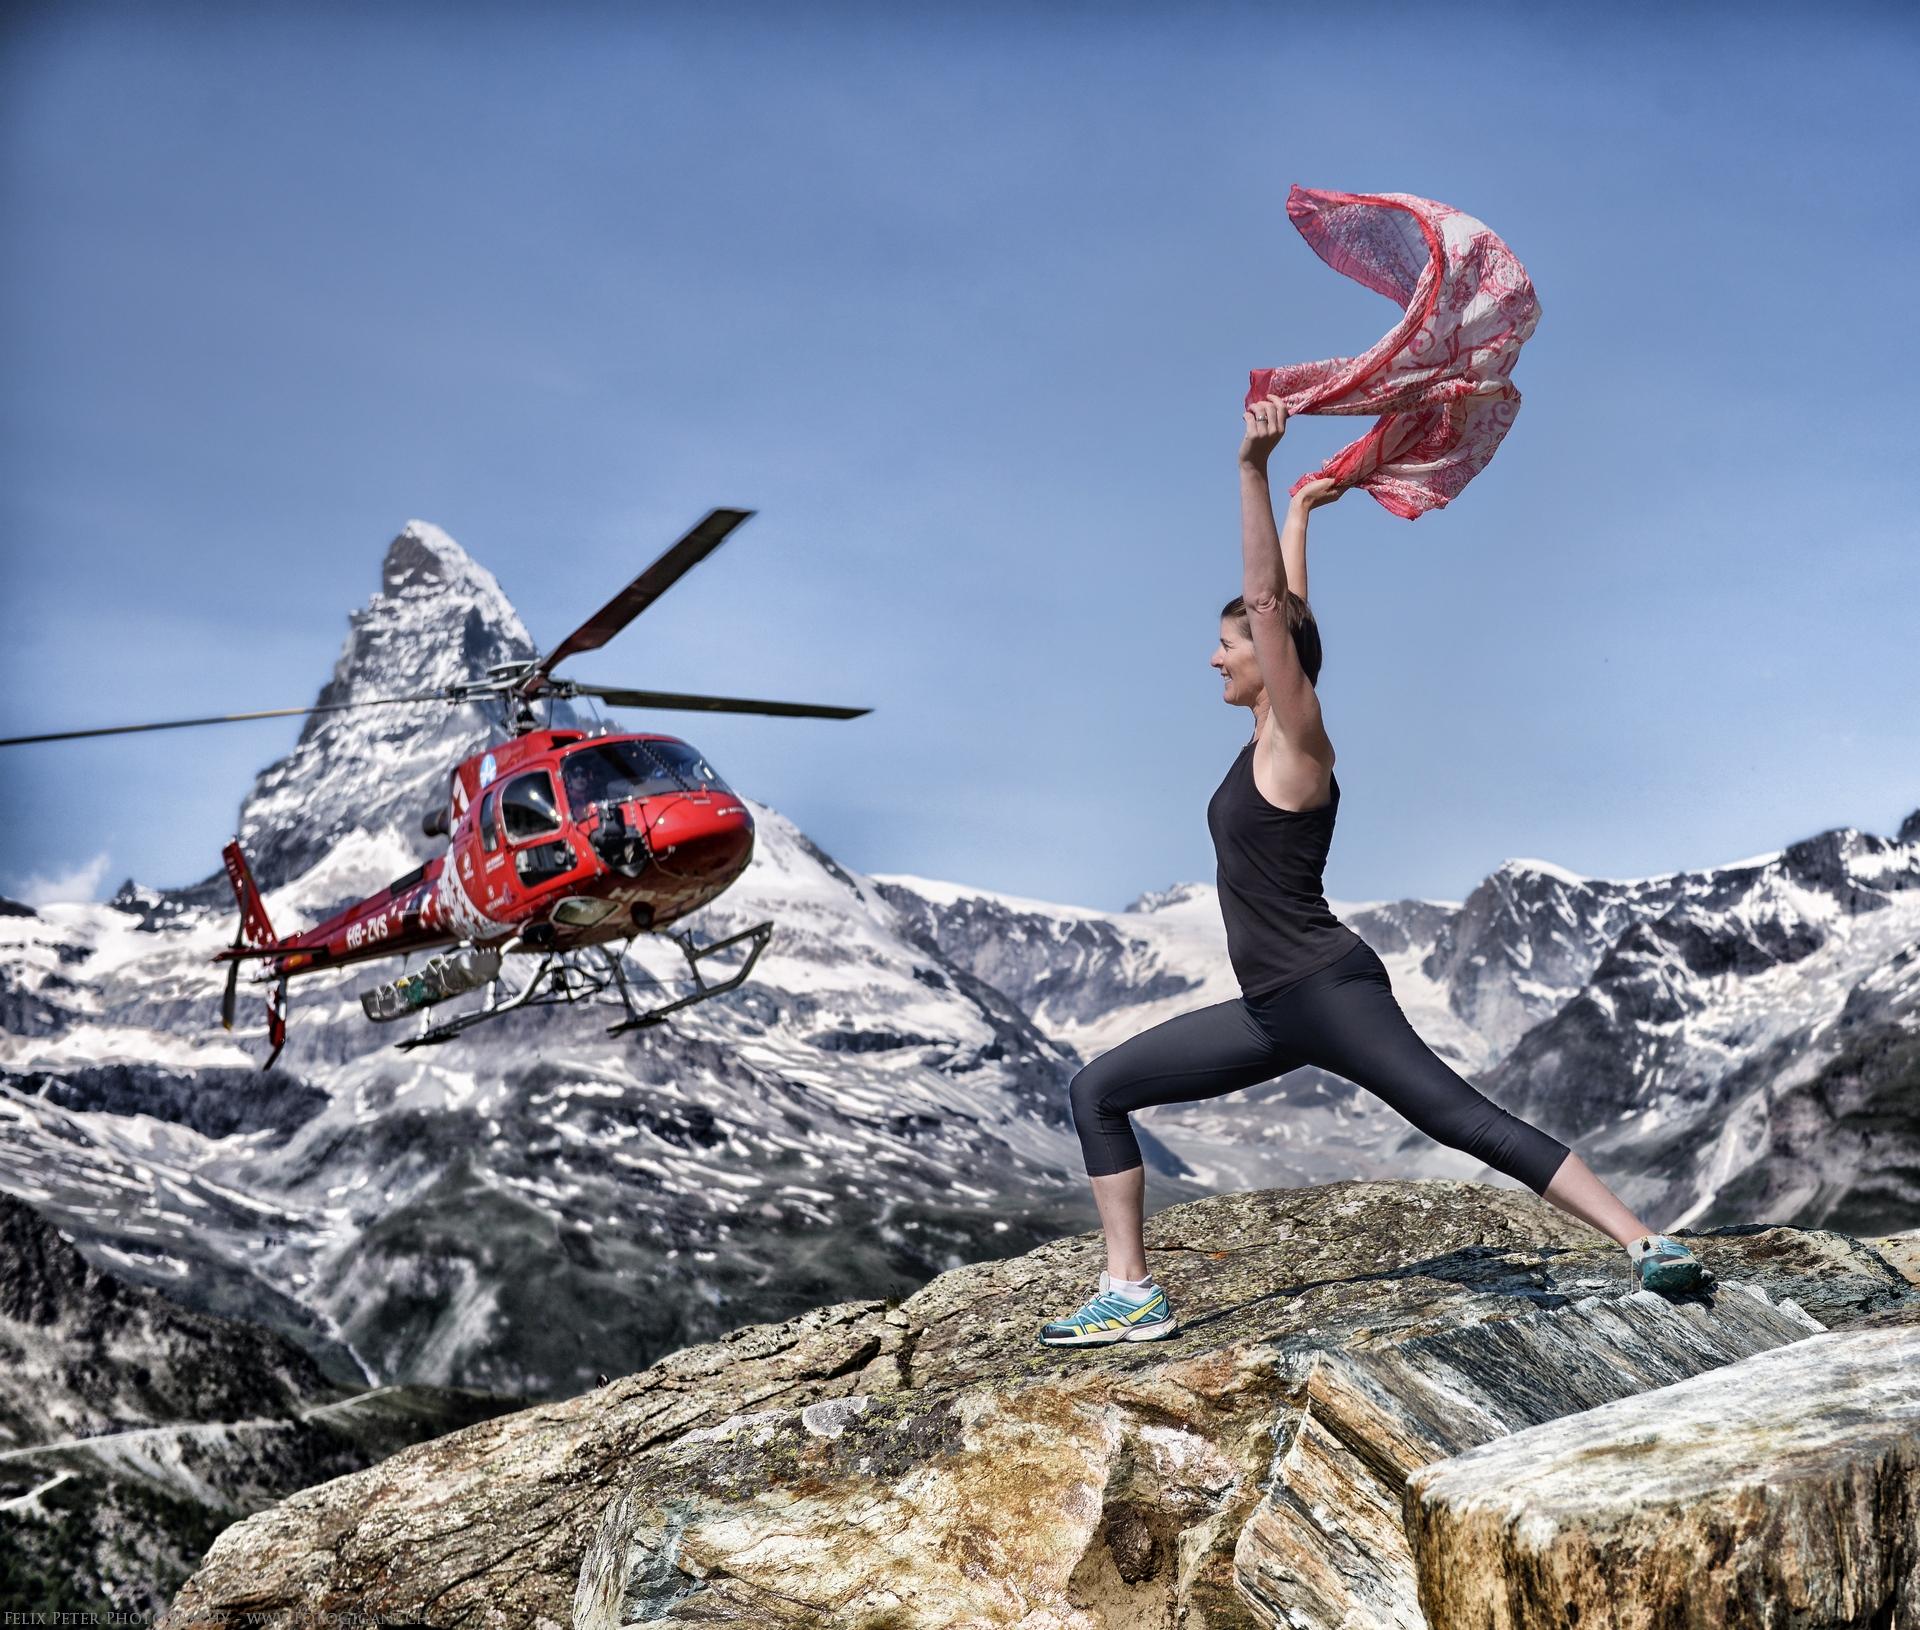 Felix-Peter-Yoga-Pilates-Dance-Fotografie_Bern_159.jpg